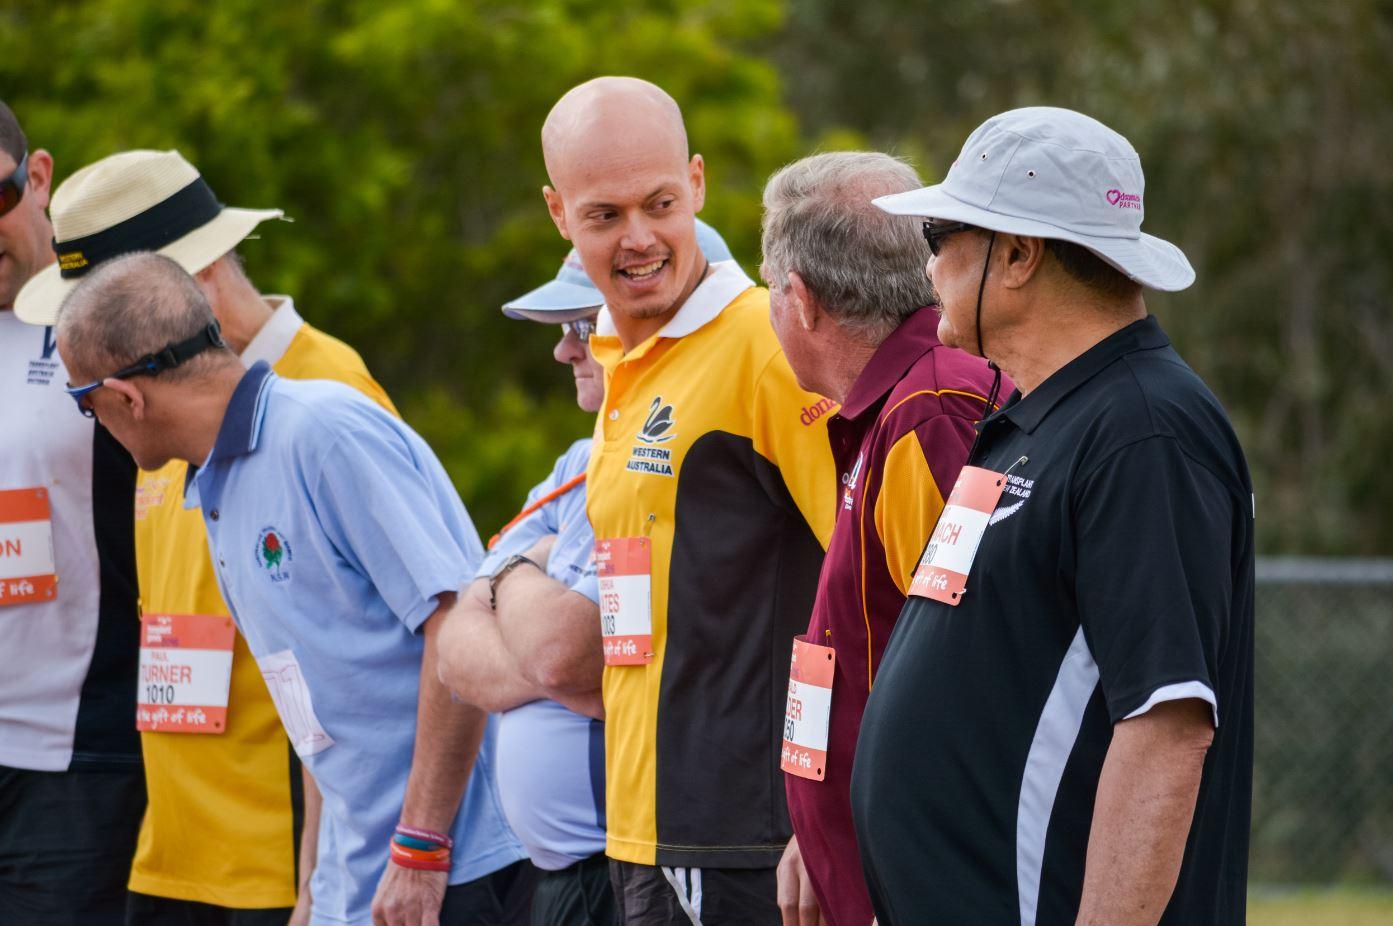 WA's Joshua Yates will work on his speed training at the Australian Institute of Sport